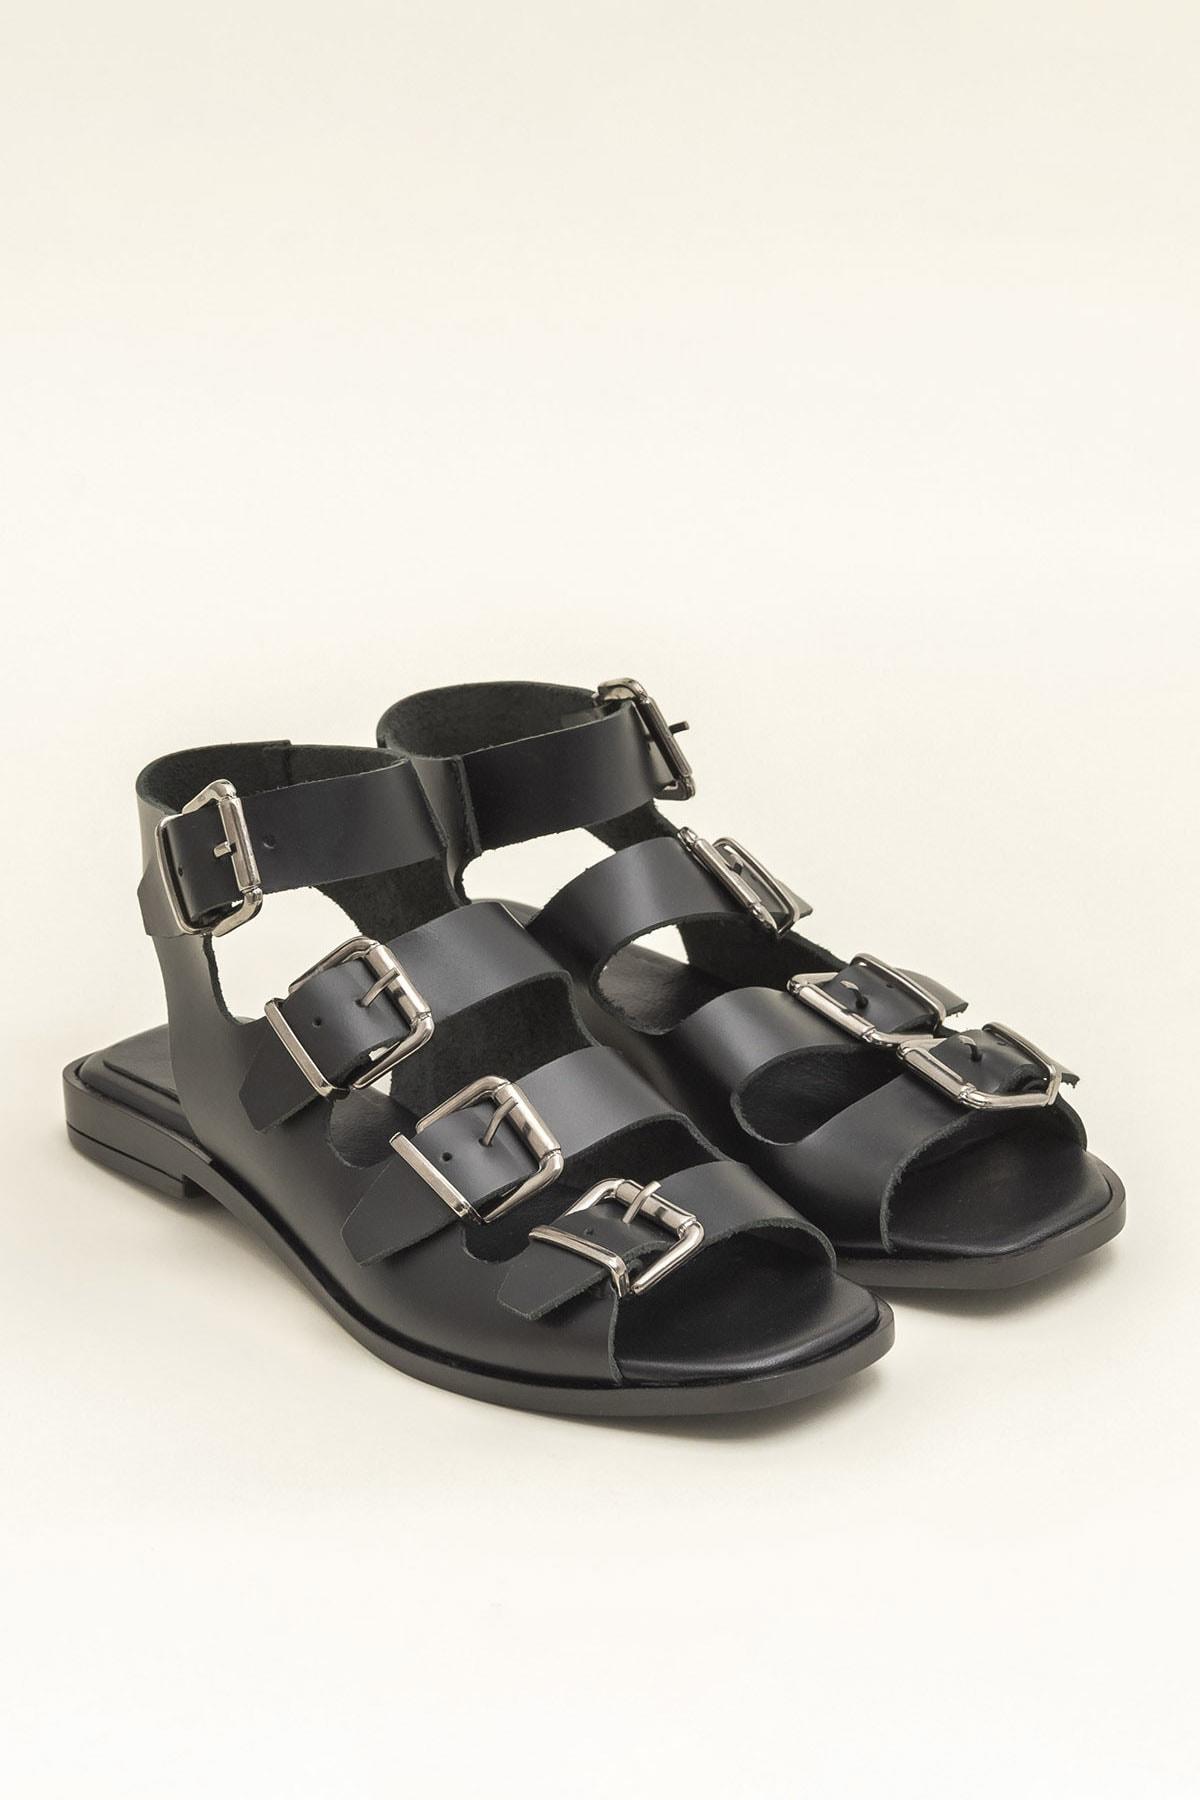 Elle Shoes Hakiki Deri Rahel Siyah Kadın  Sandalet 20YEK3143754 2